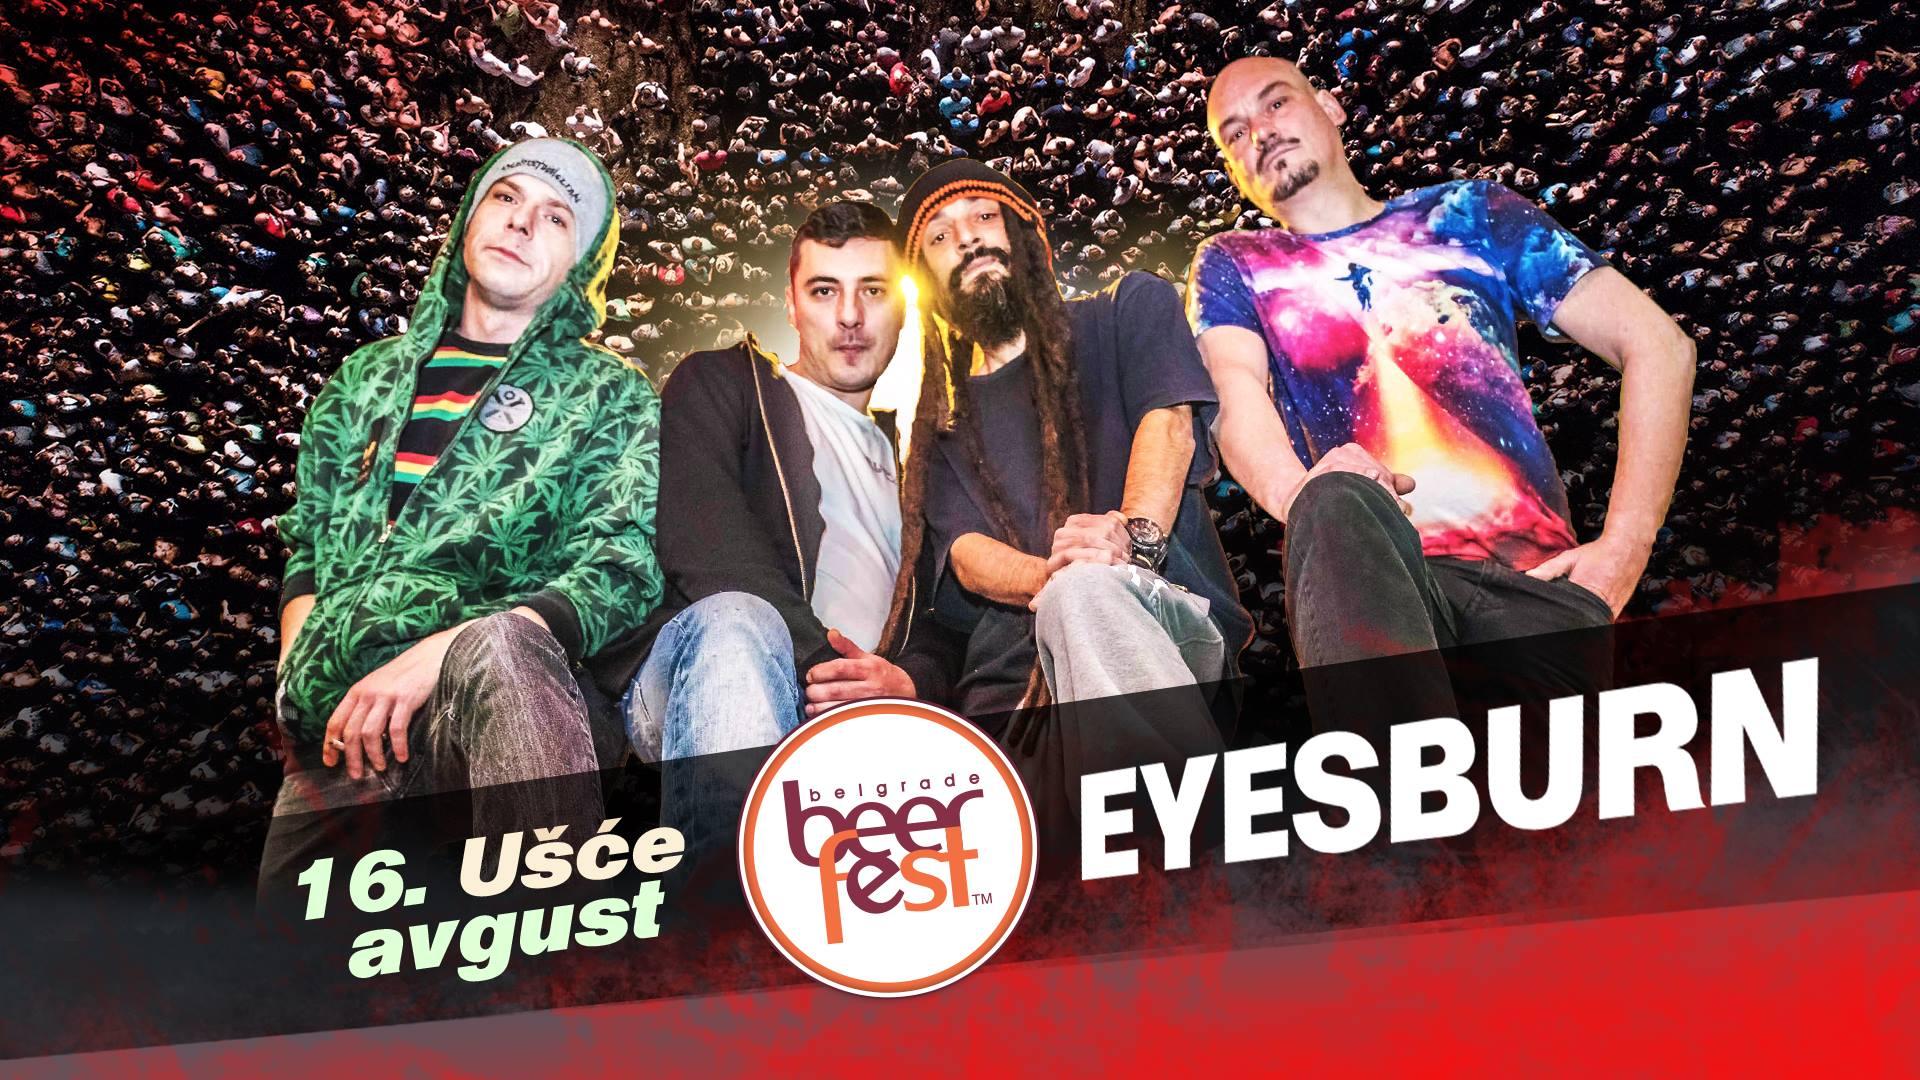 Eyesburn live 16.08.2019. Belgrade Beer Fest